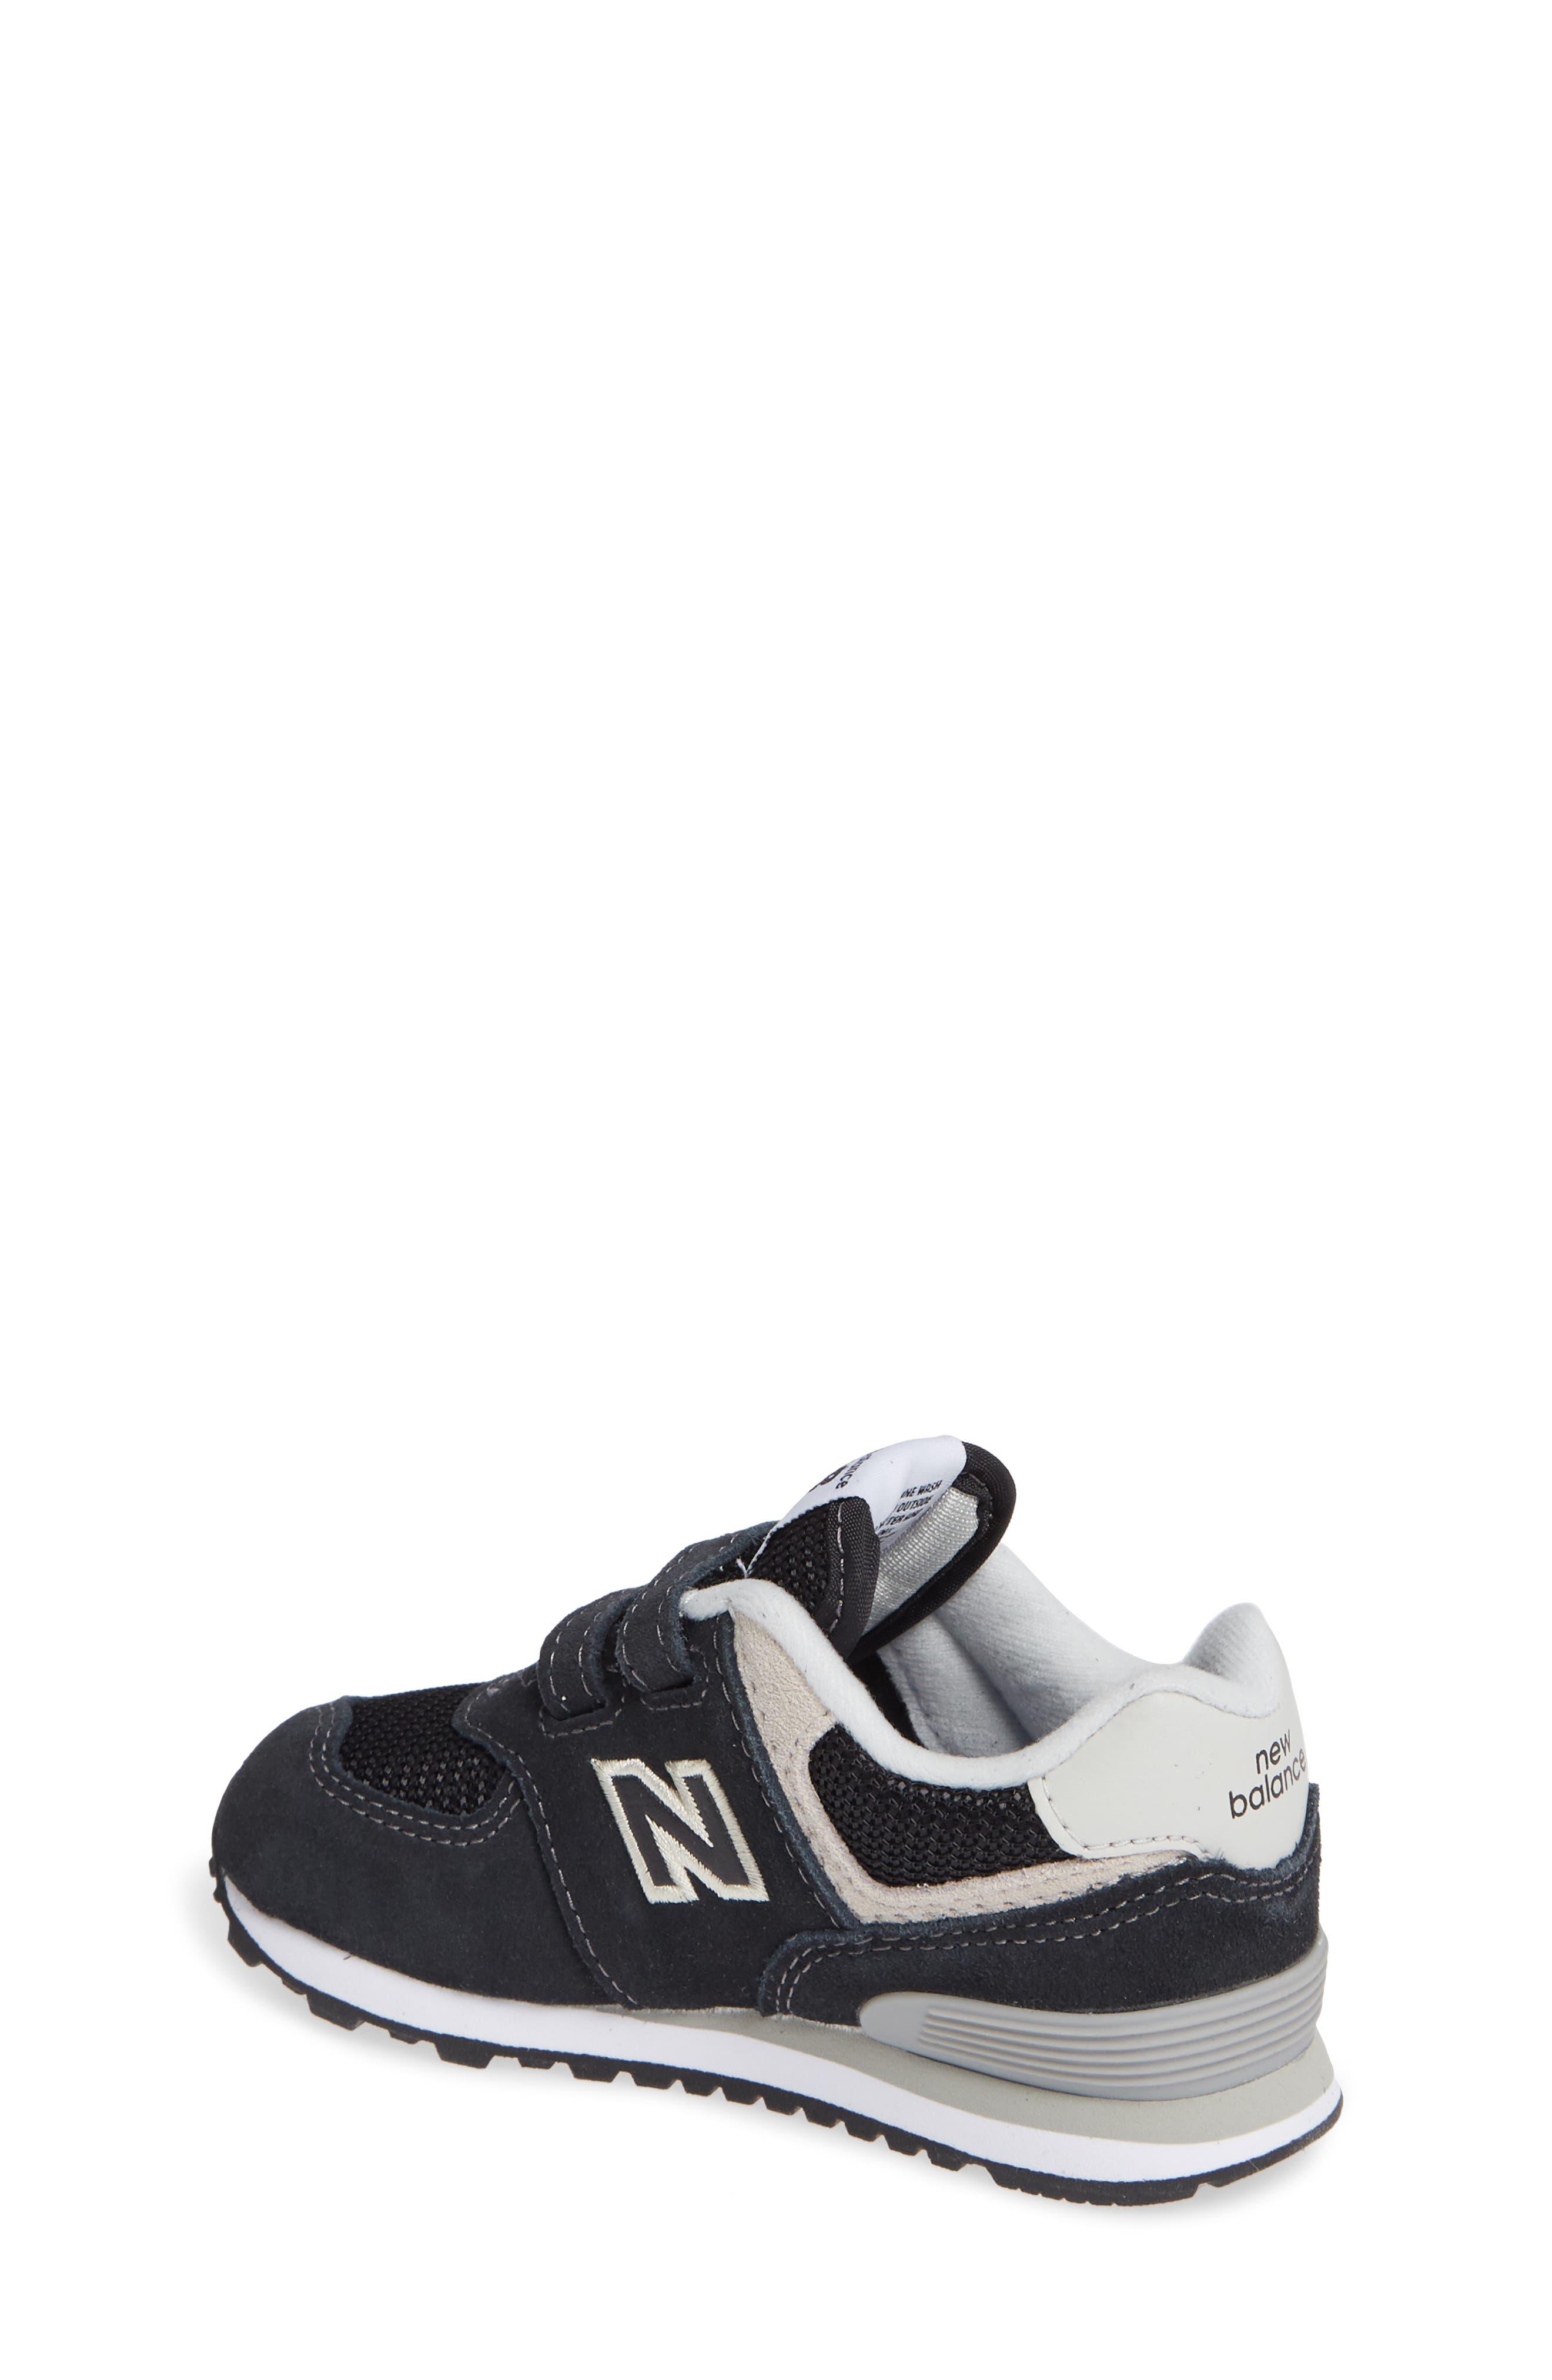 '574 Core' Sneaker,                             Alternate thumbnail 2, color,                             BLACK/ GREY